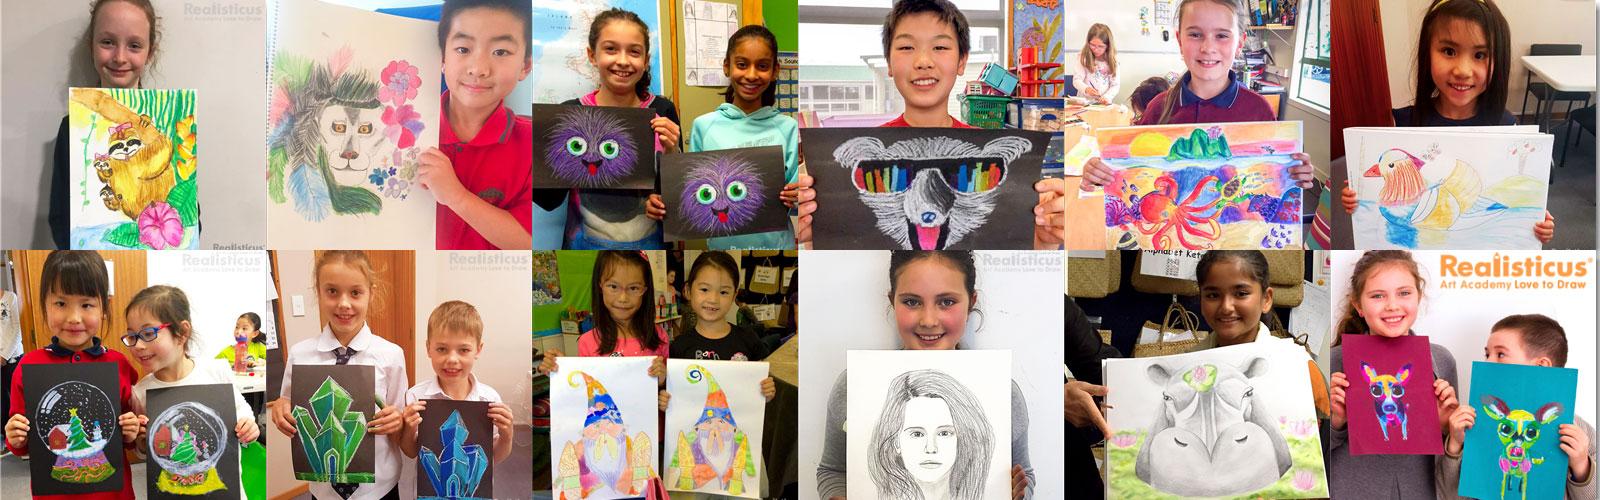 Realisticus Art Academy Kids Art Show in Auckland